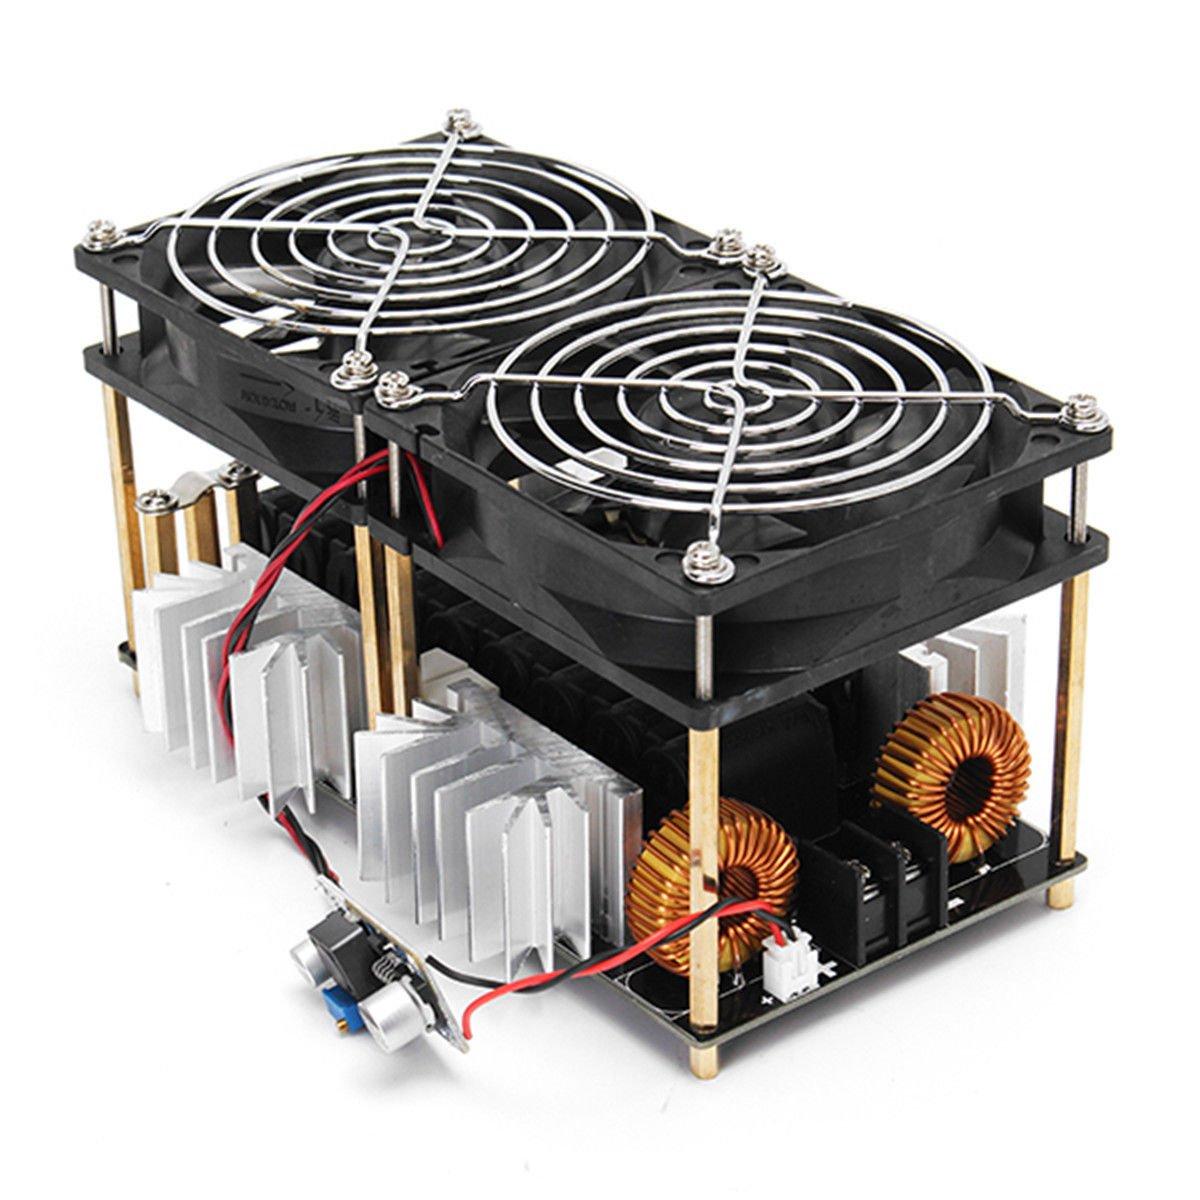 Toogoo 1800w Zvs Induction Heating Board Module Flyback Driver Transformer Tesla Coil On Heater Schematic Diagram Fan